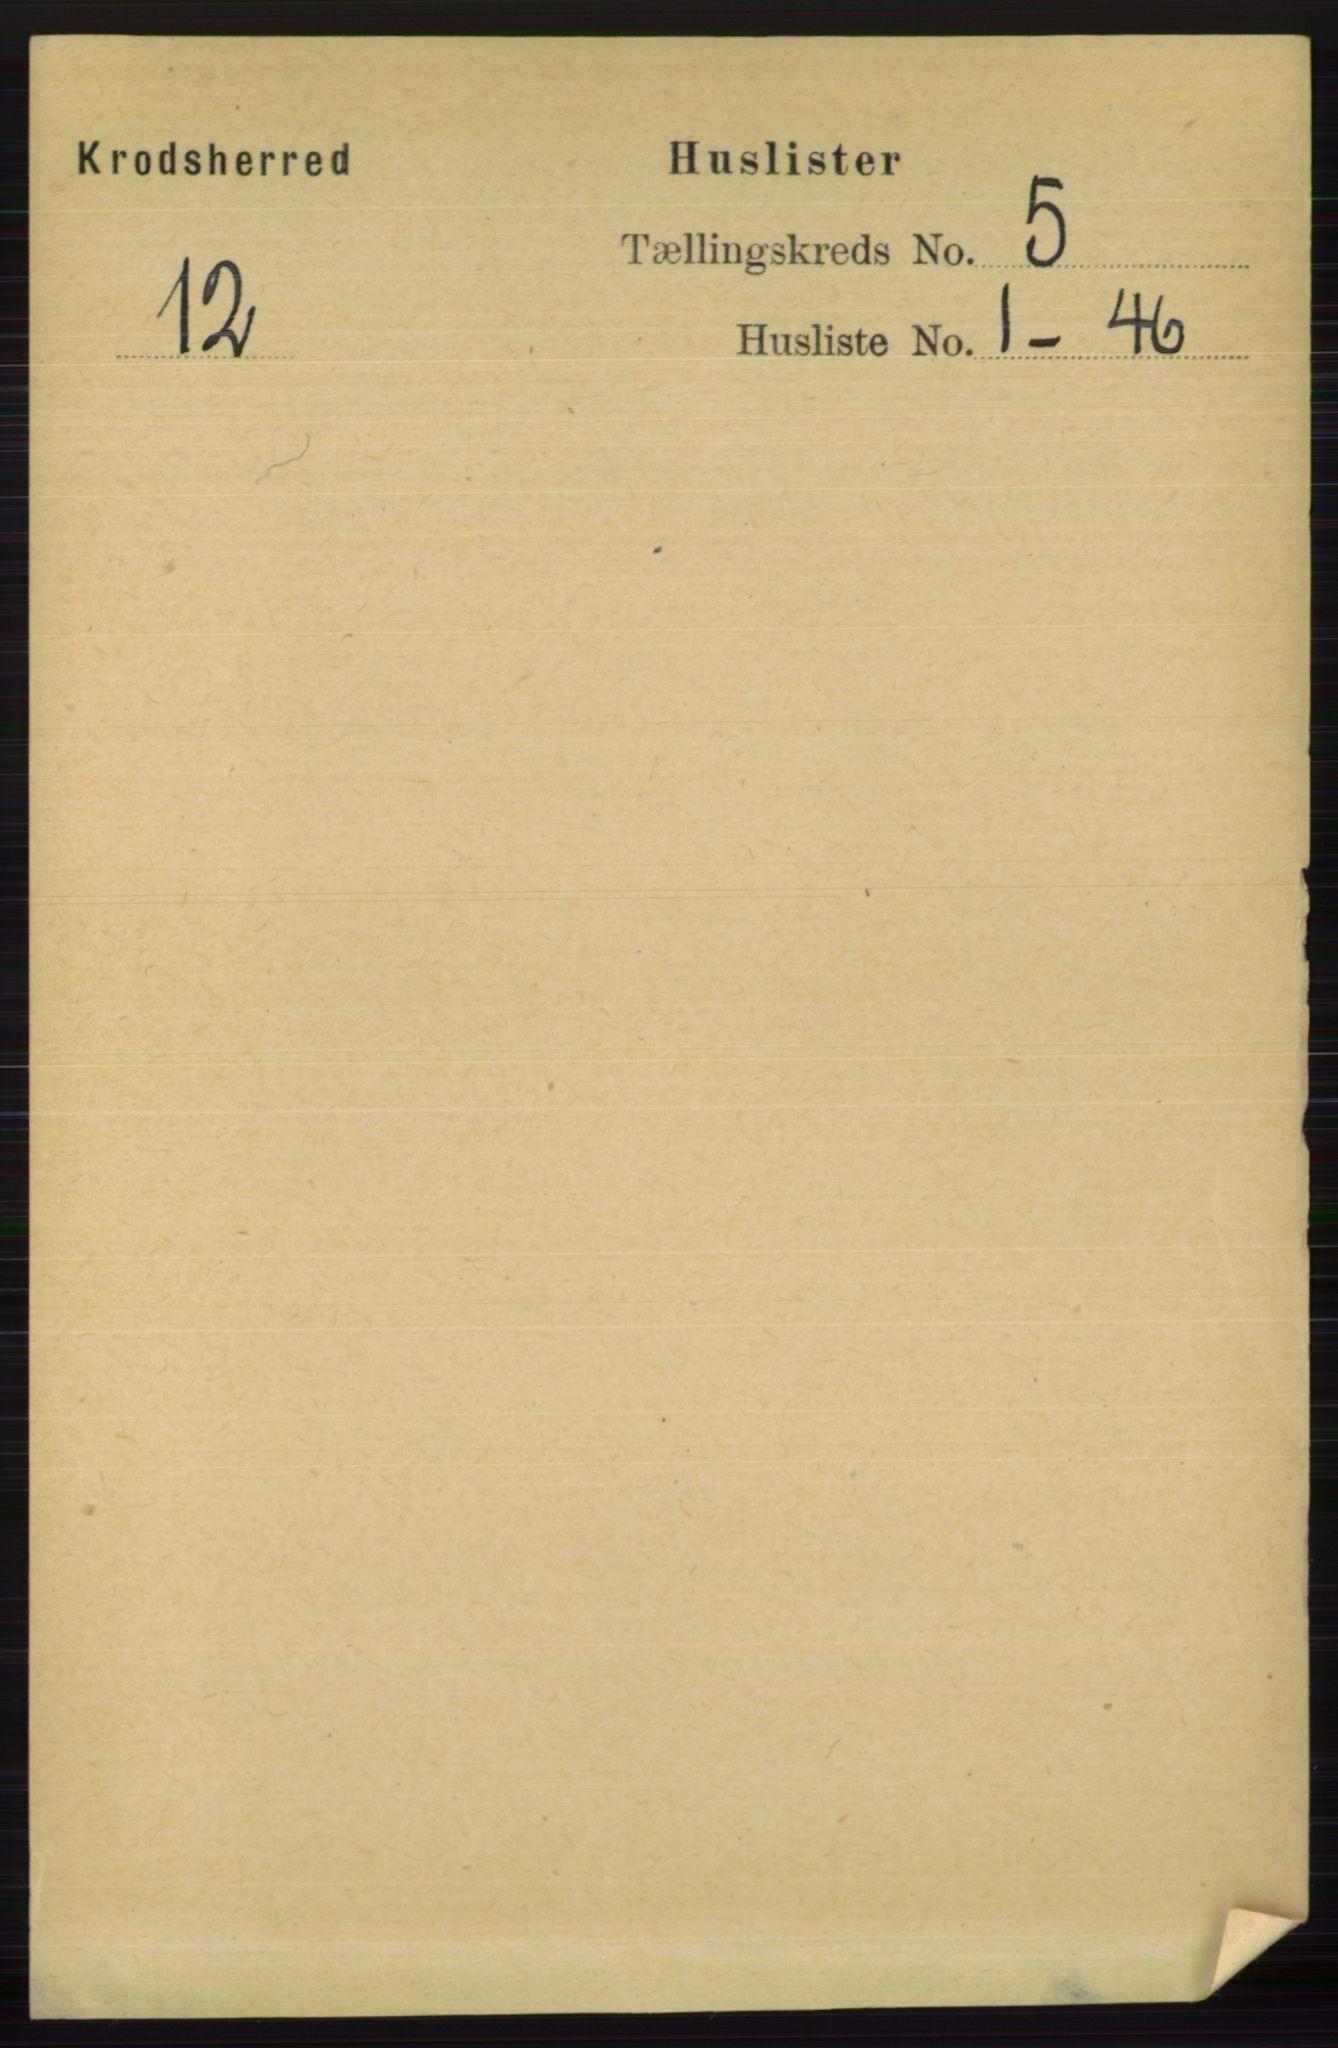 RA, Folketelling 1891 for 0621 Sigdal herred, 1891, s. 6269